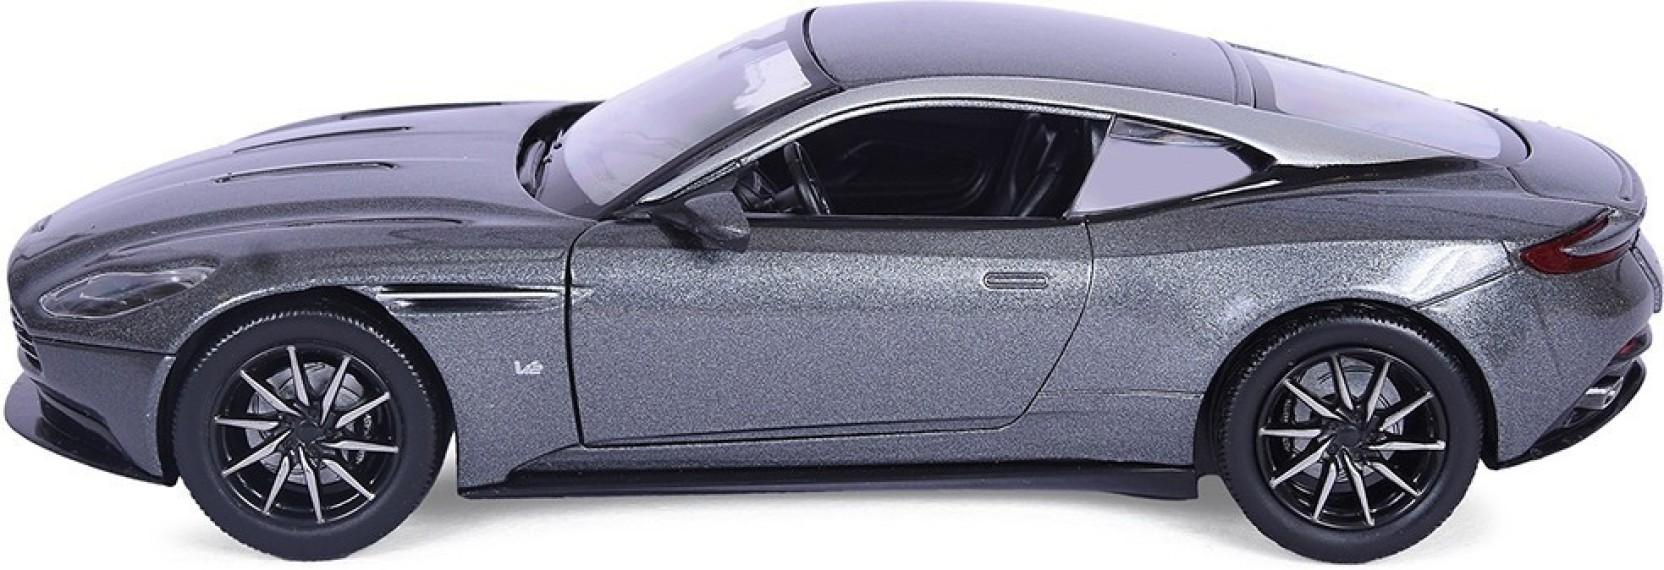 motormax 1:24 aston martin db11 diecast car - 1:24 aston martin db11